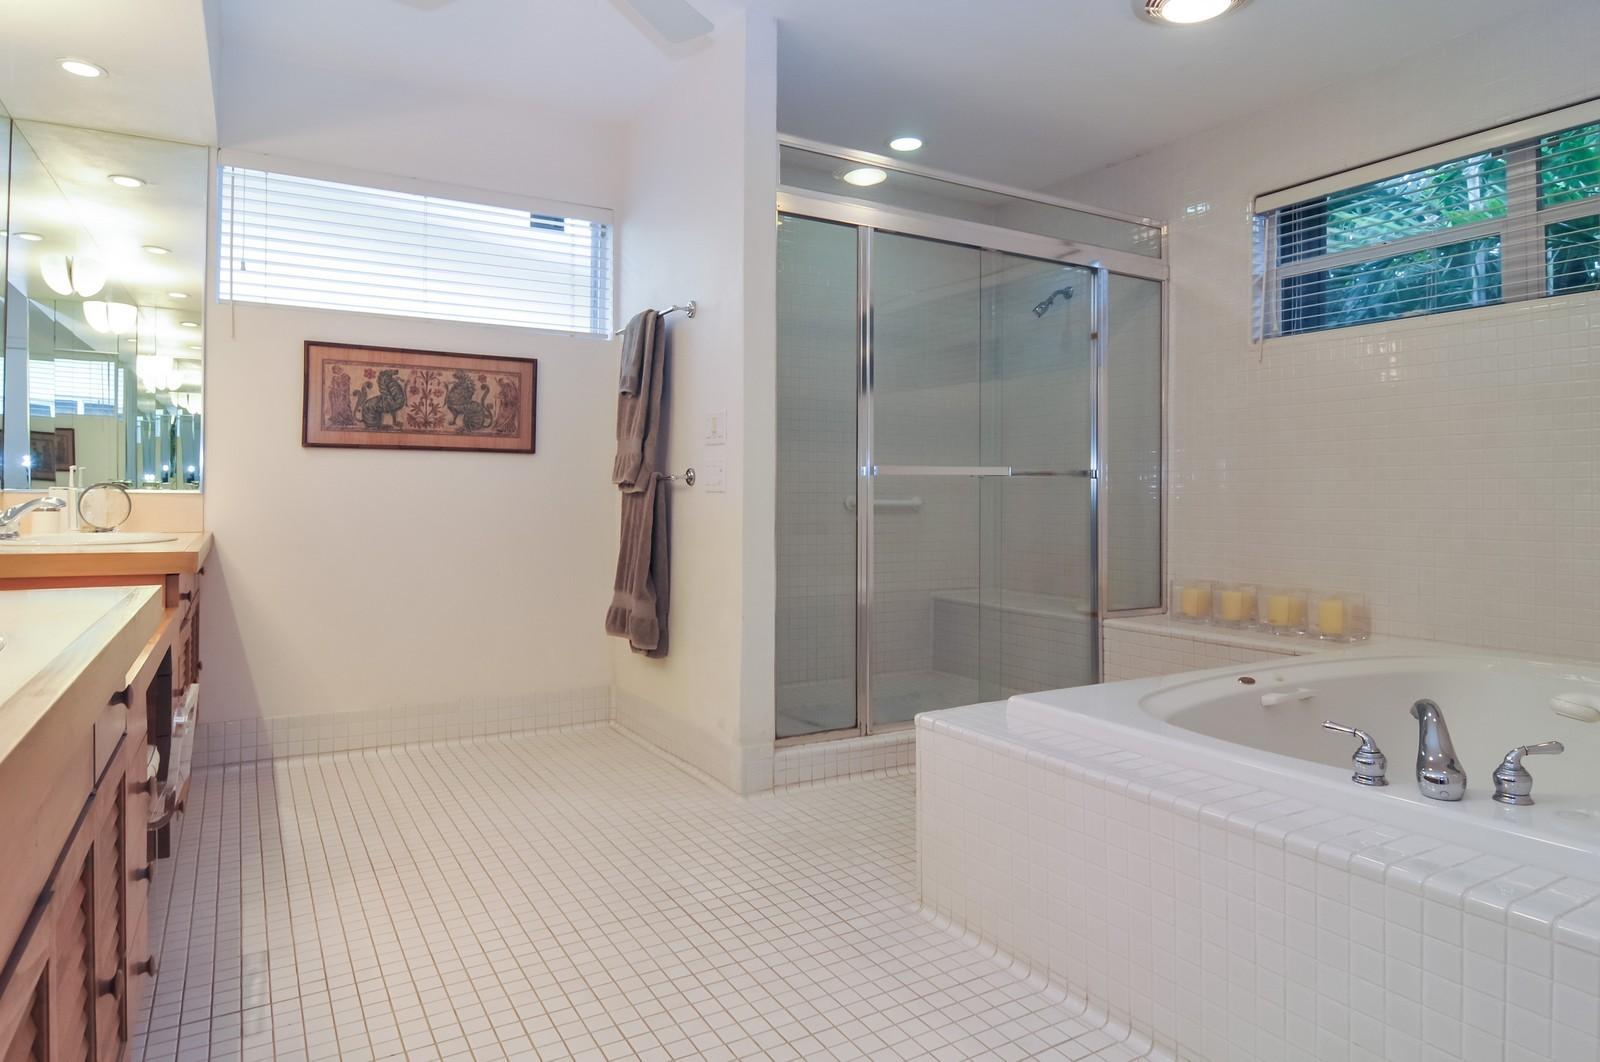 Real Estate Photography - 240 East Shore Drive, Miami, FL, 33133 - Master Bathroom